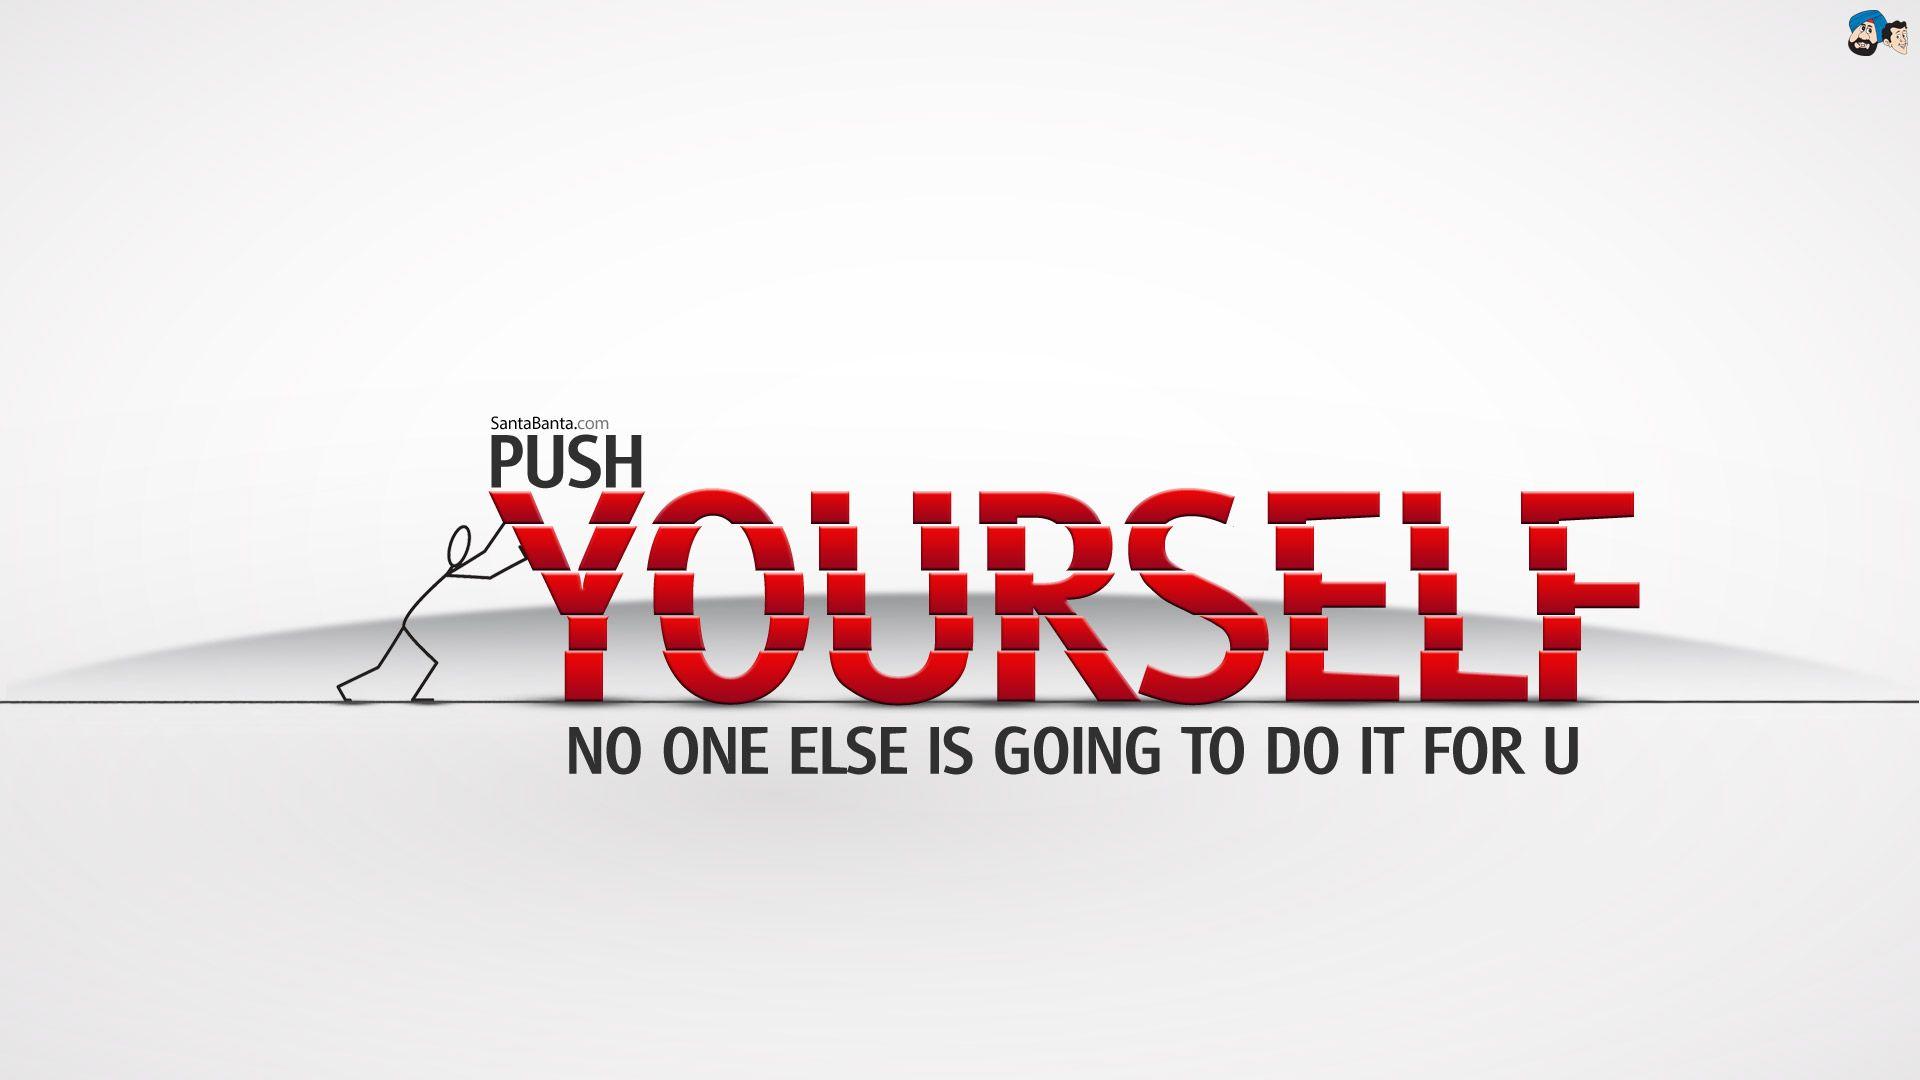 Women Boxing Quotes wallpaper. Work motivational